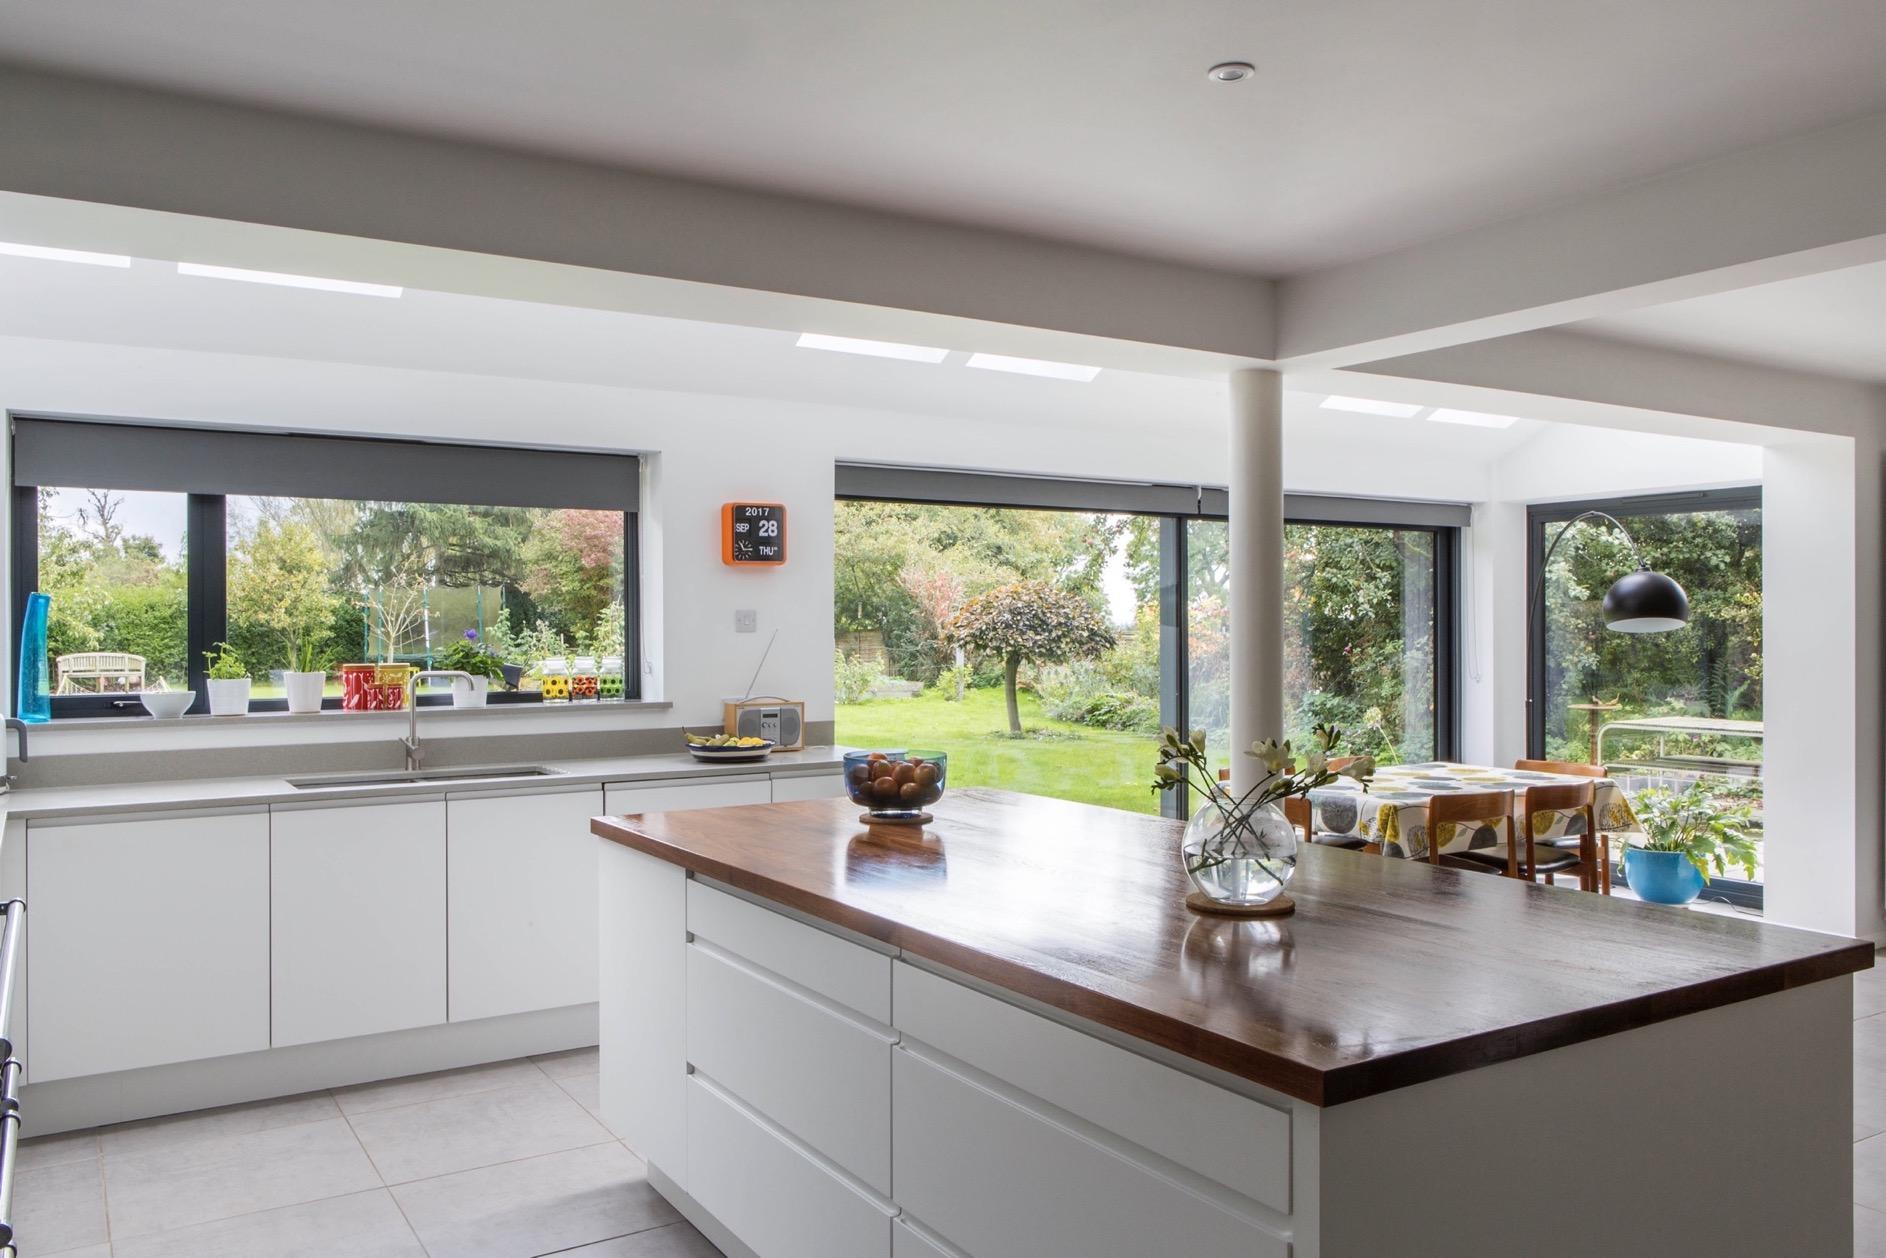 garden view kitchen island walnut handleless stewkley buckinghamshire 1